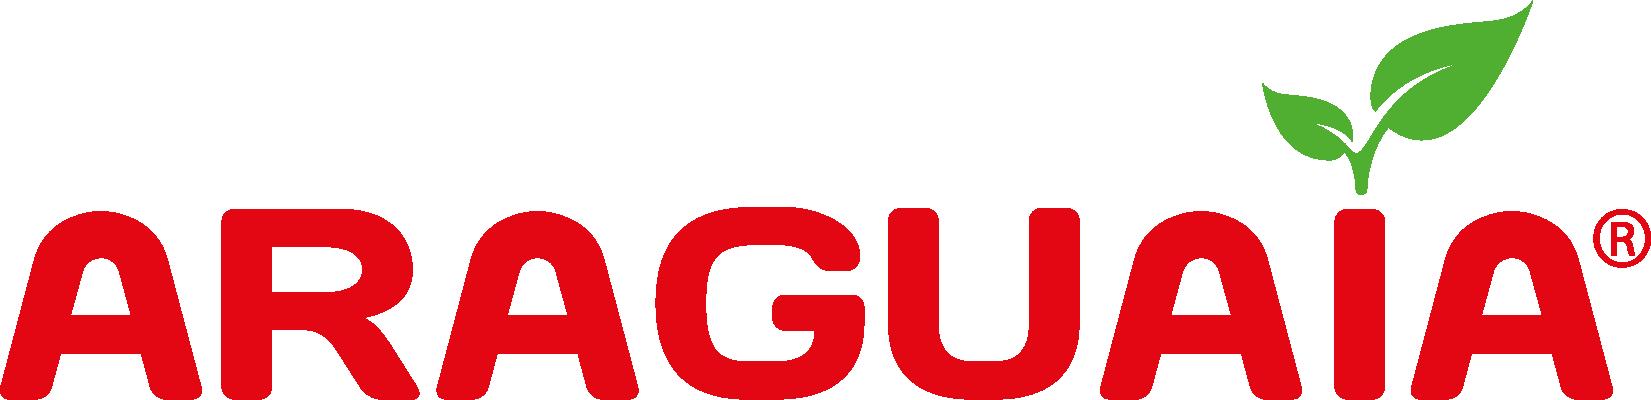 LOGO_ARAGUAIA.png